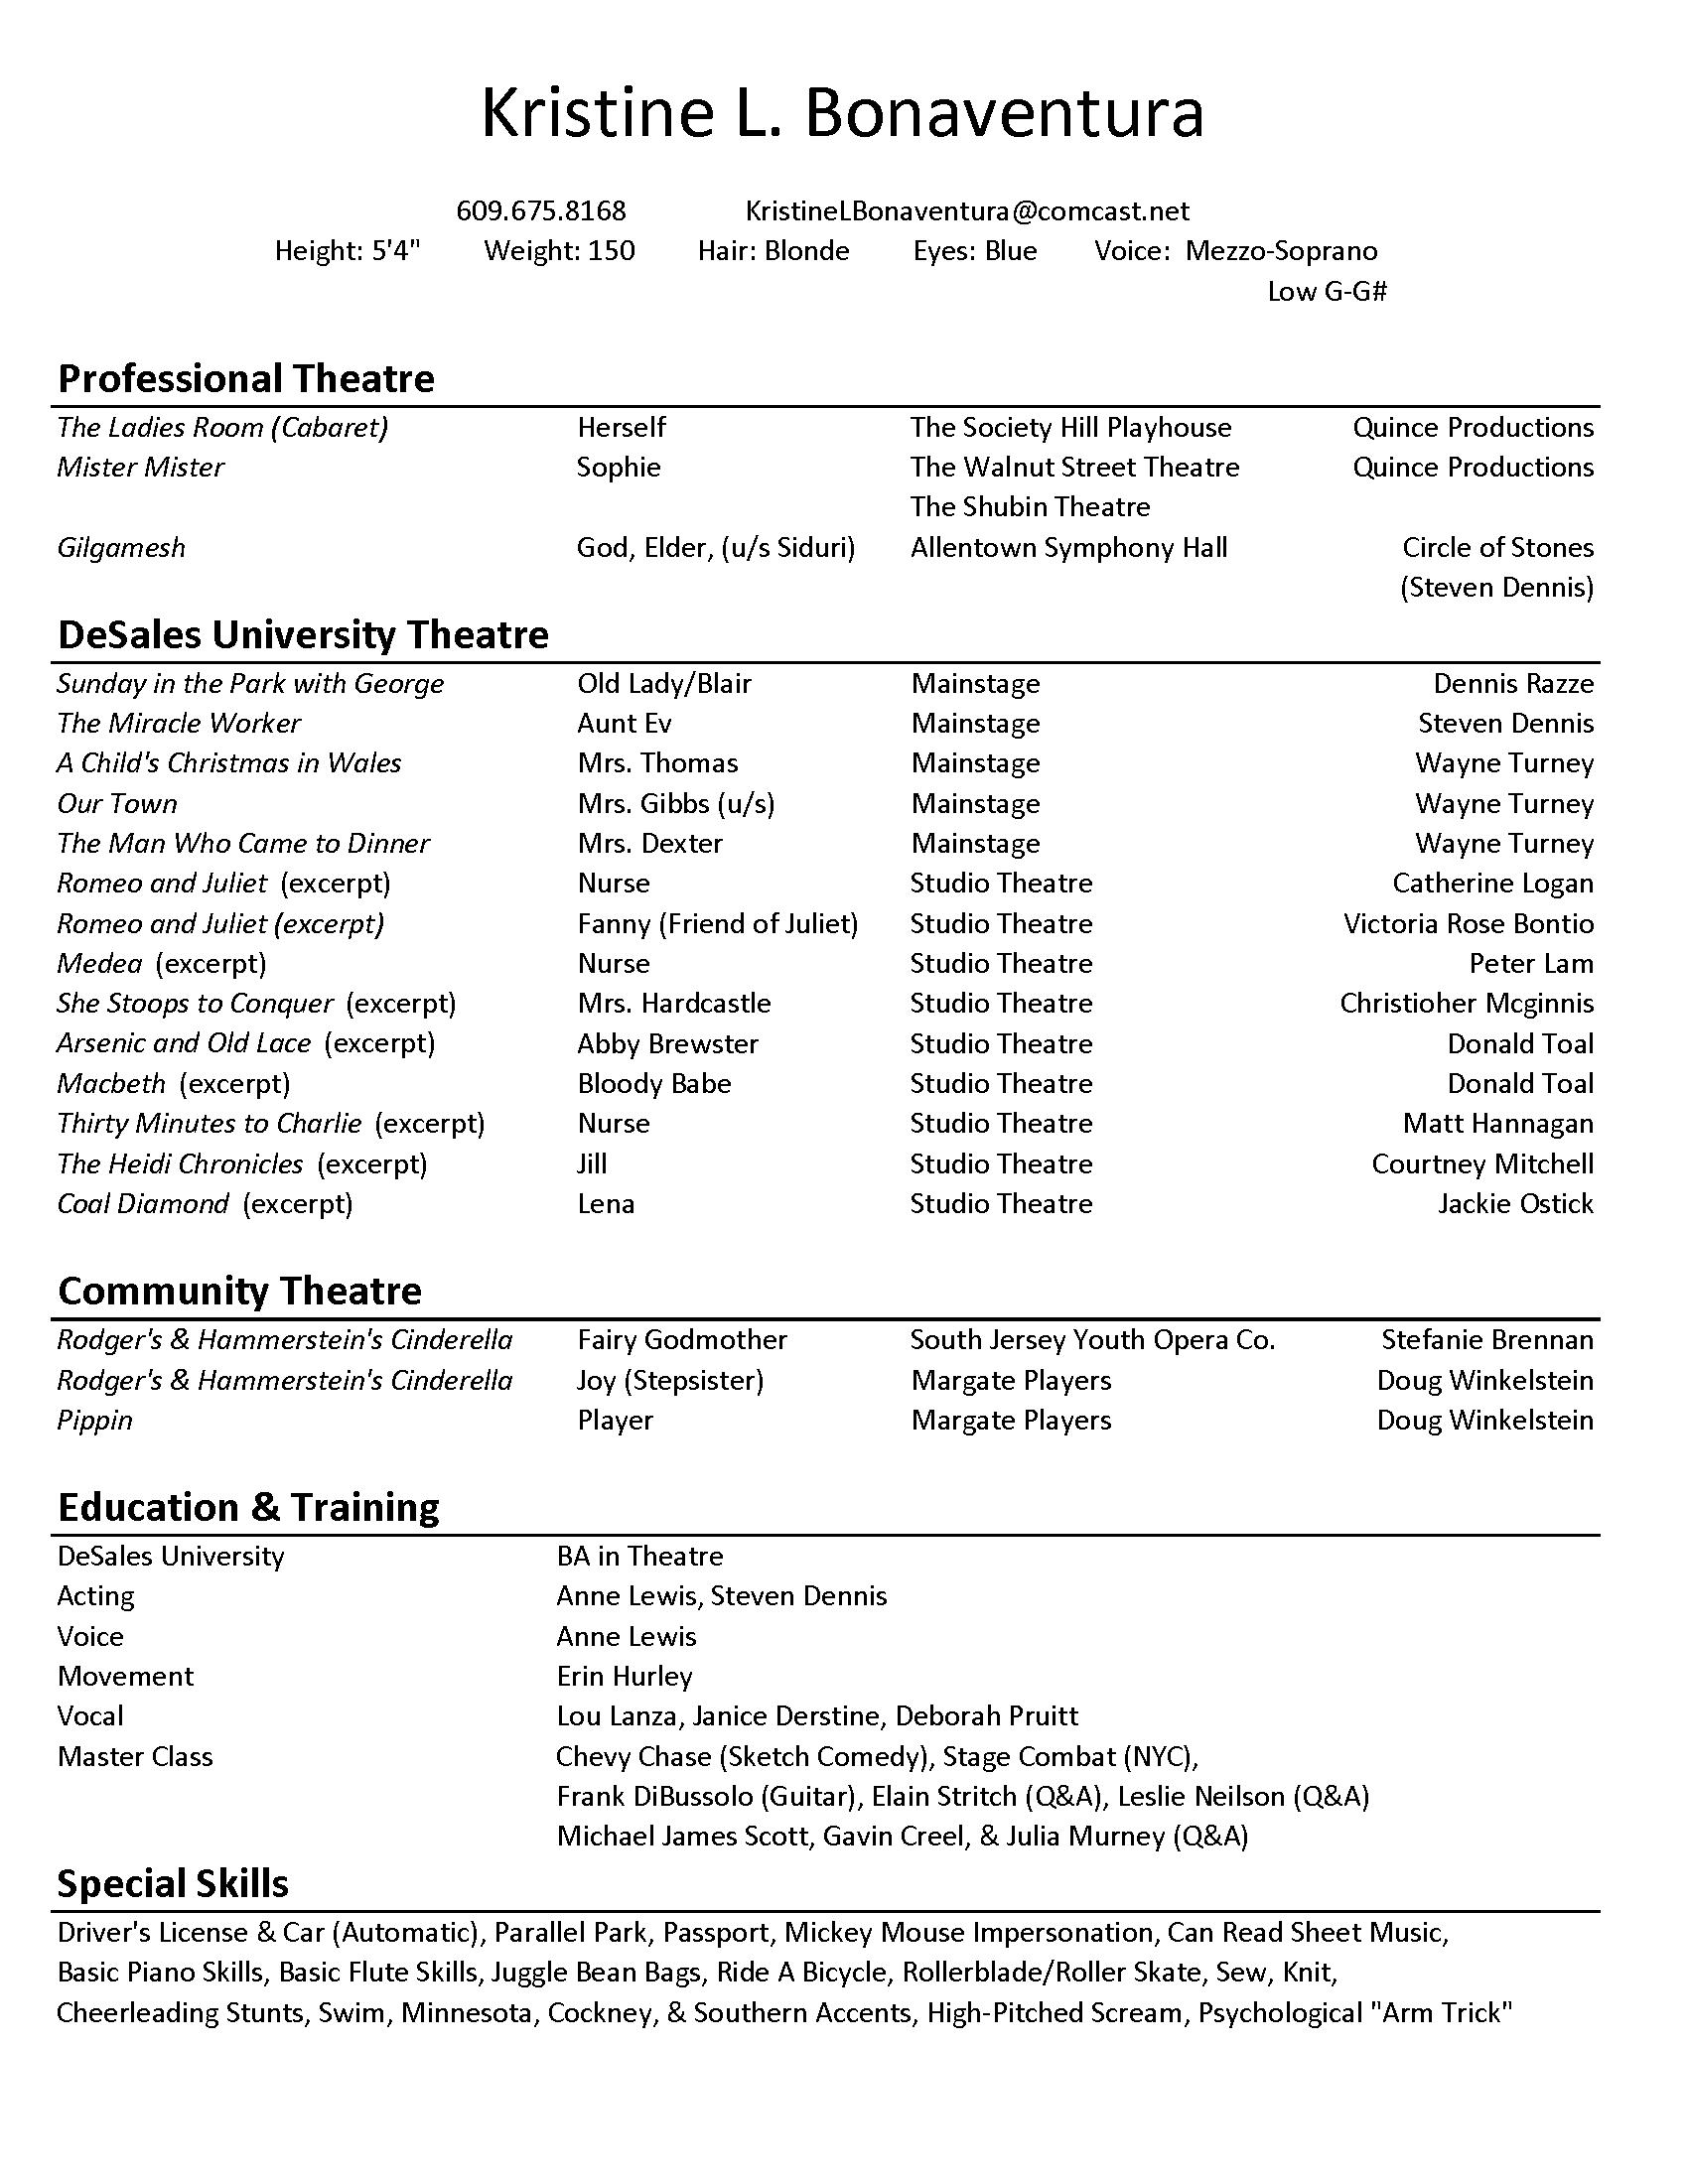 Actor Resume Example